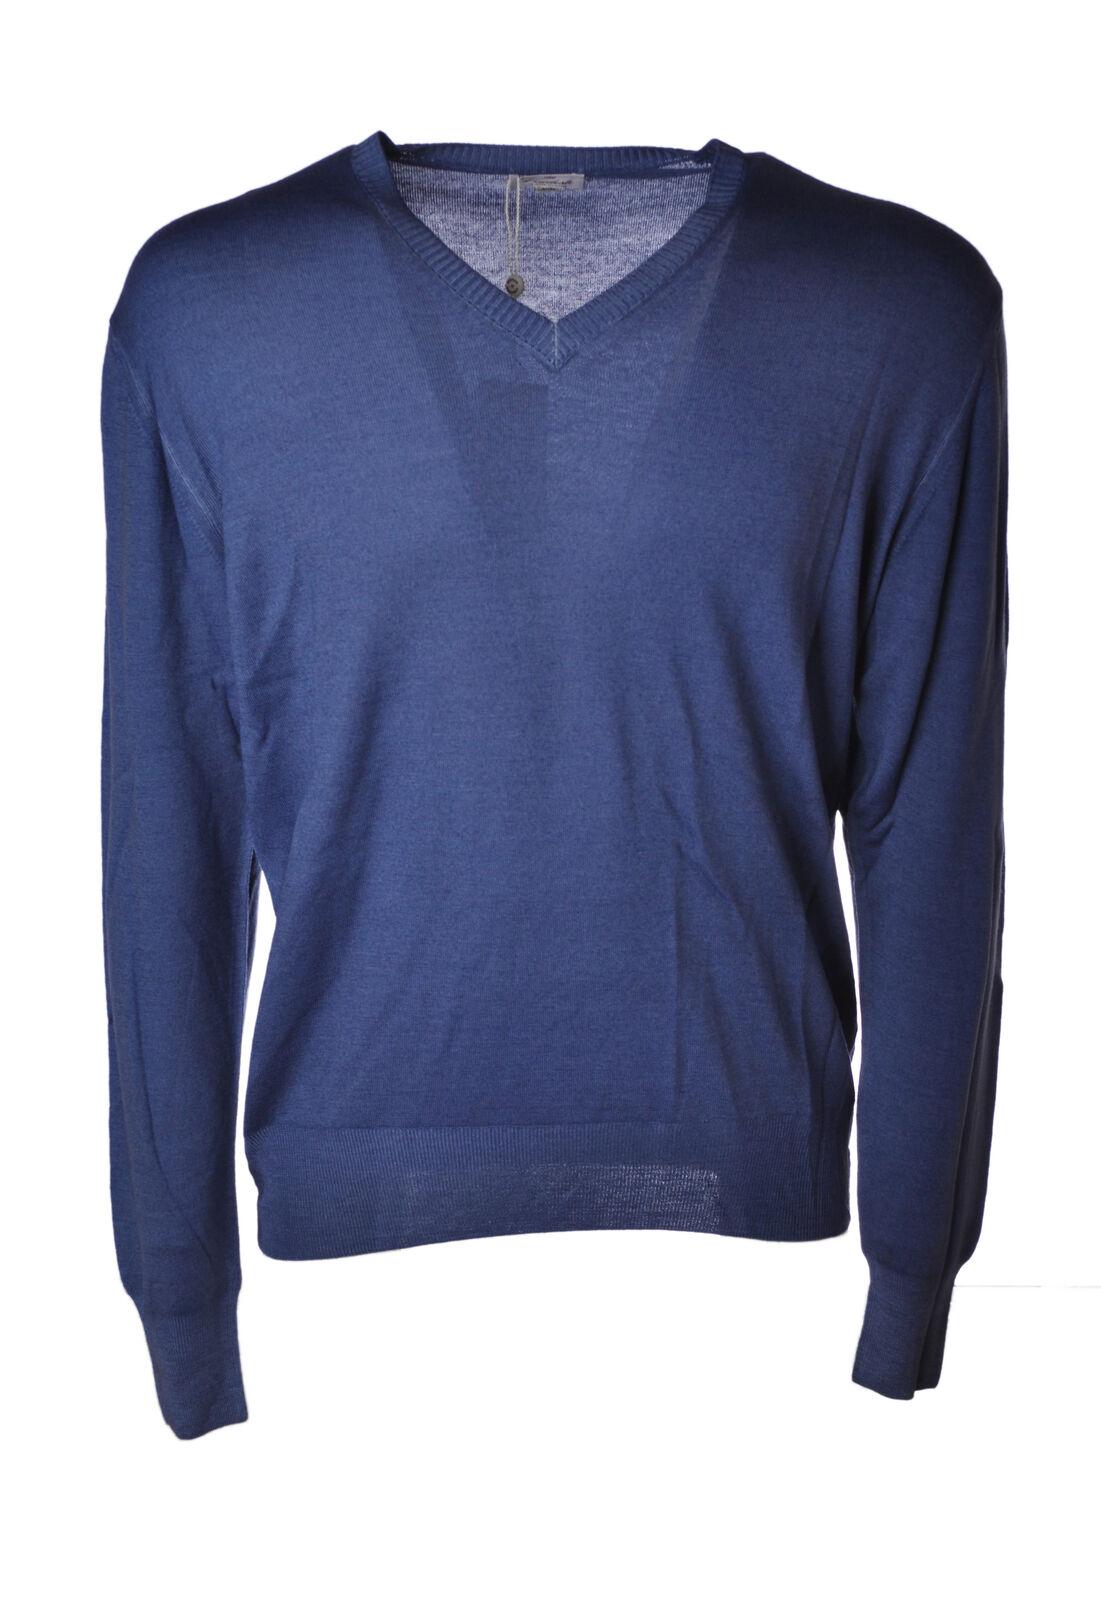 Viadeste  -  Sweaters - Male - Blau - 4677519A185147